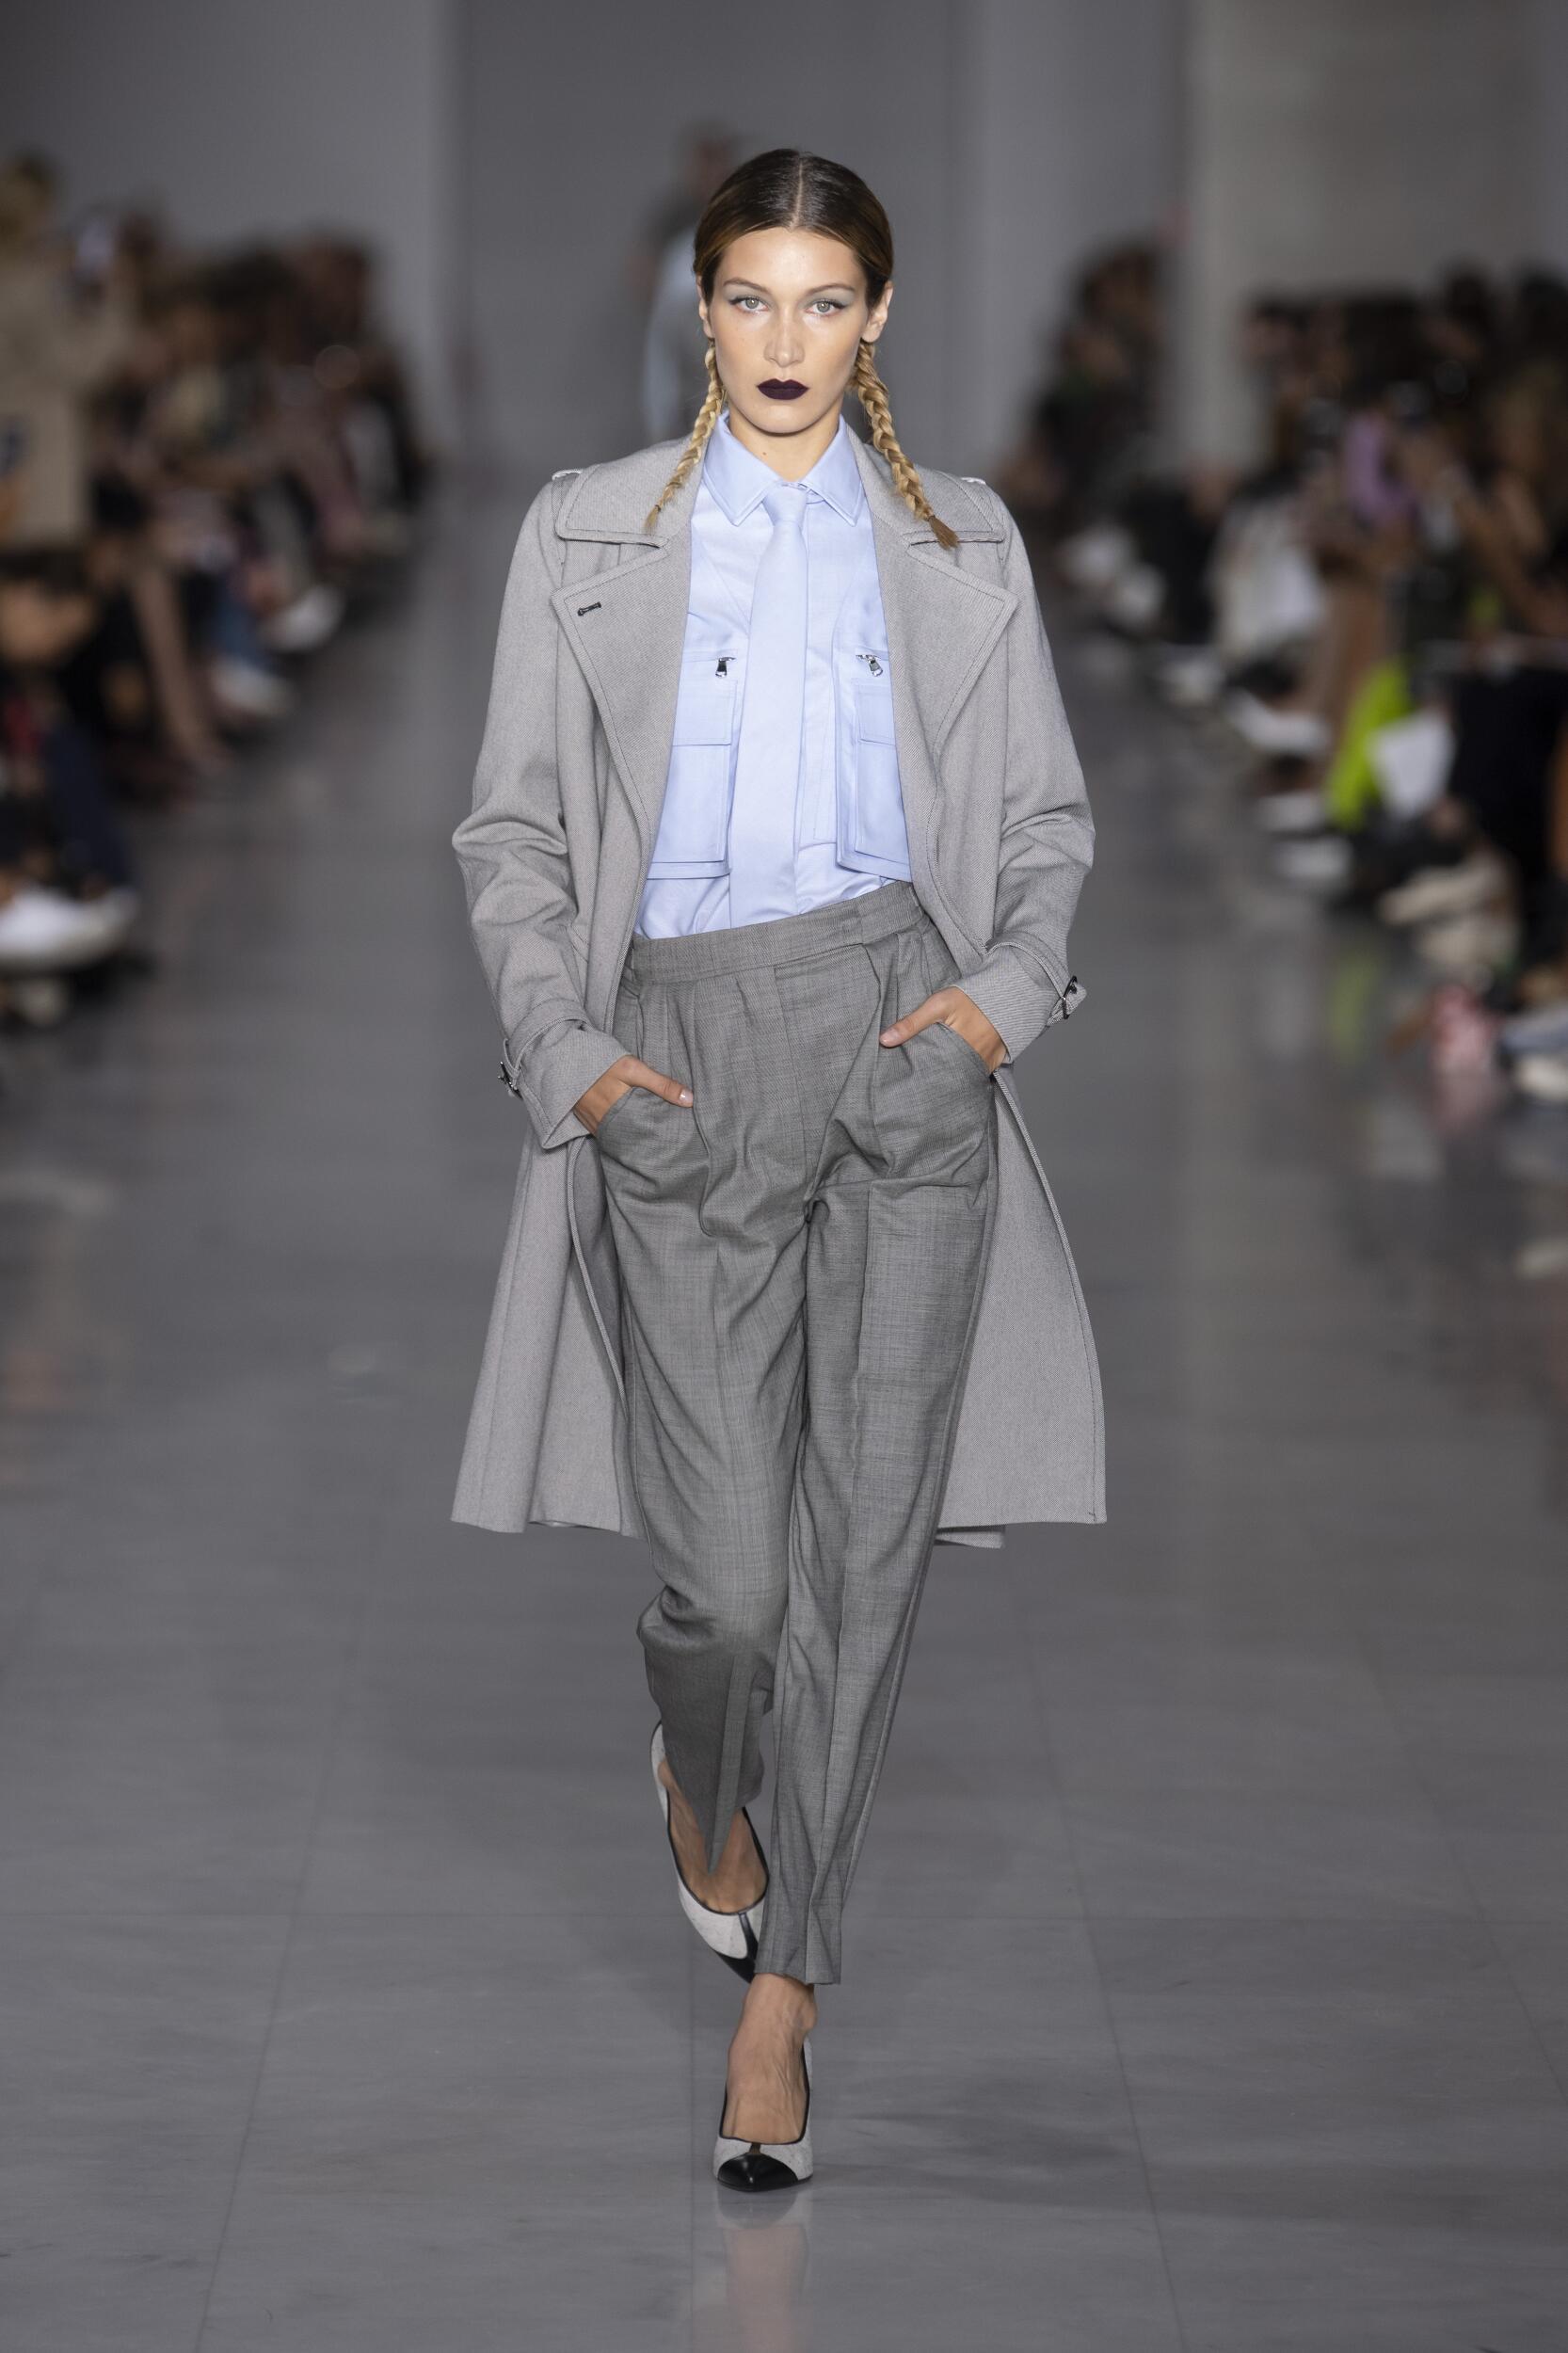 Spring 2020 Womenswear Max Mara